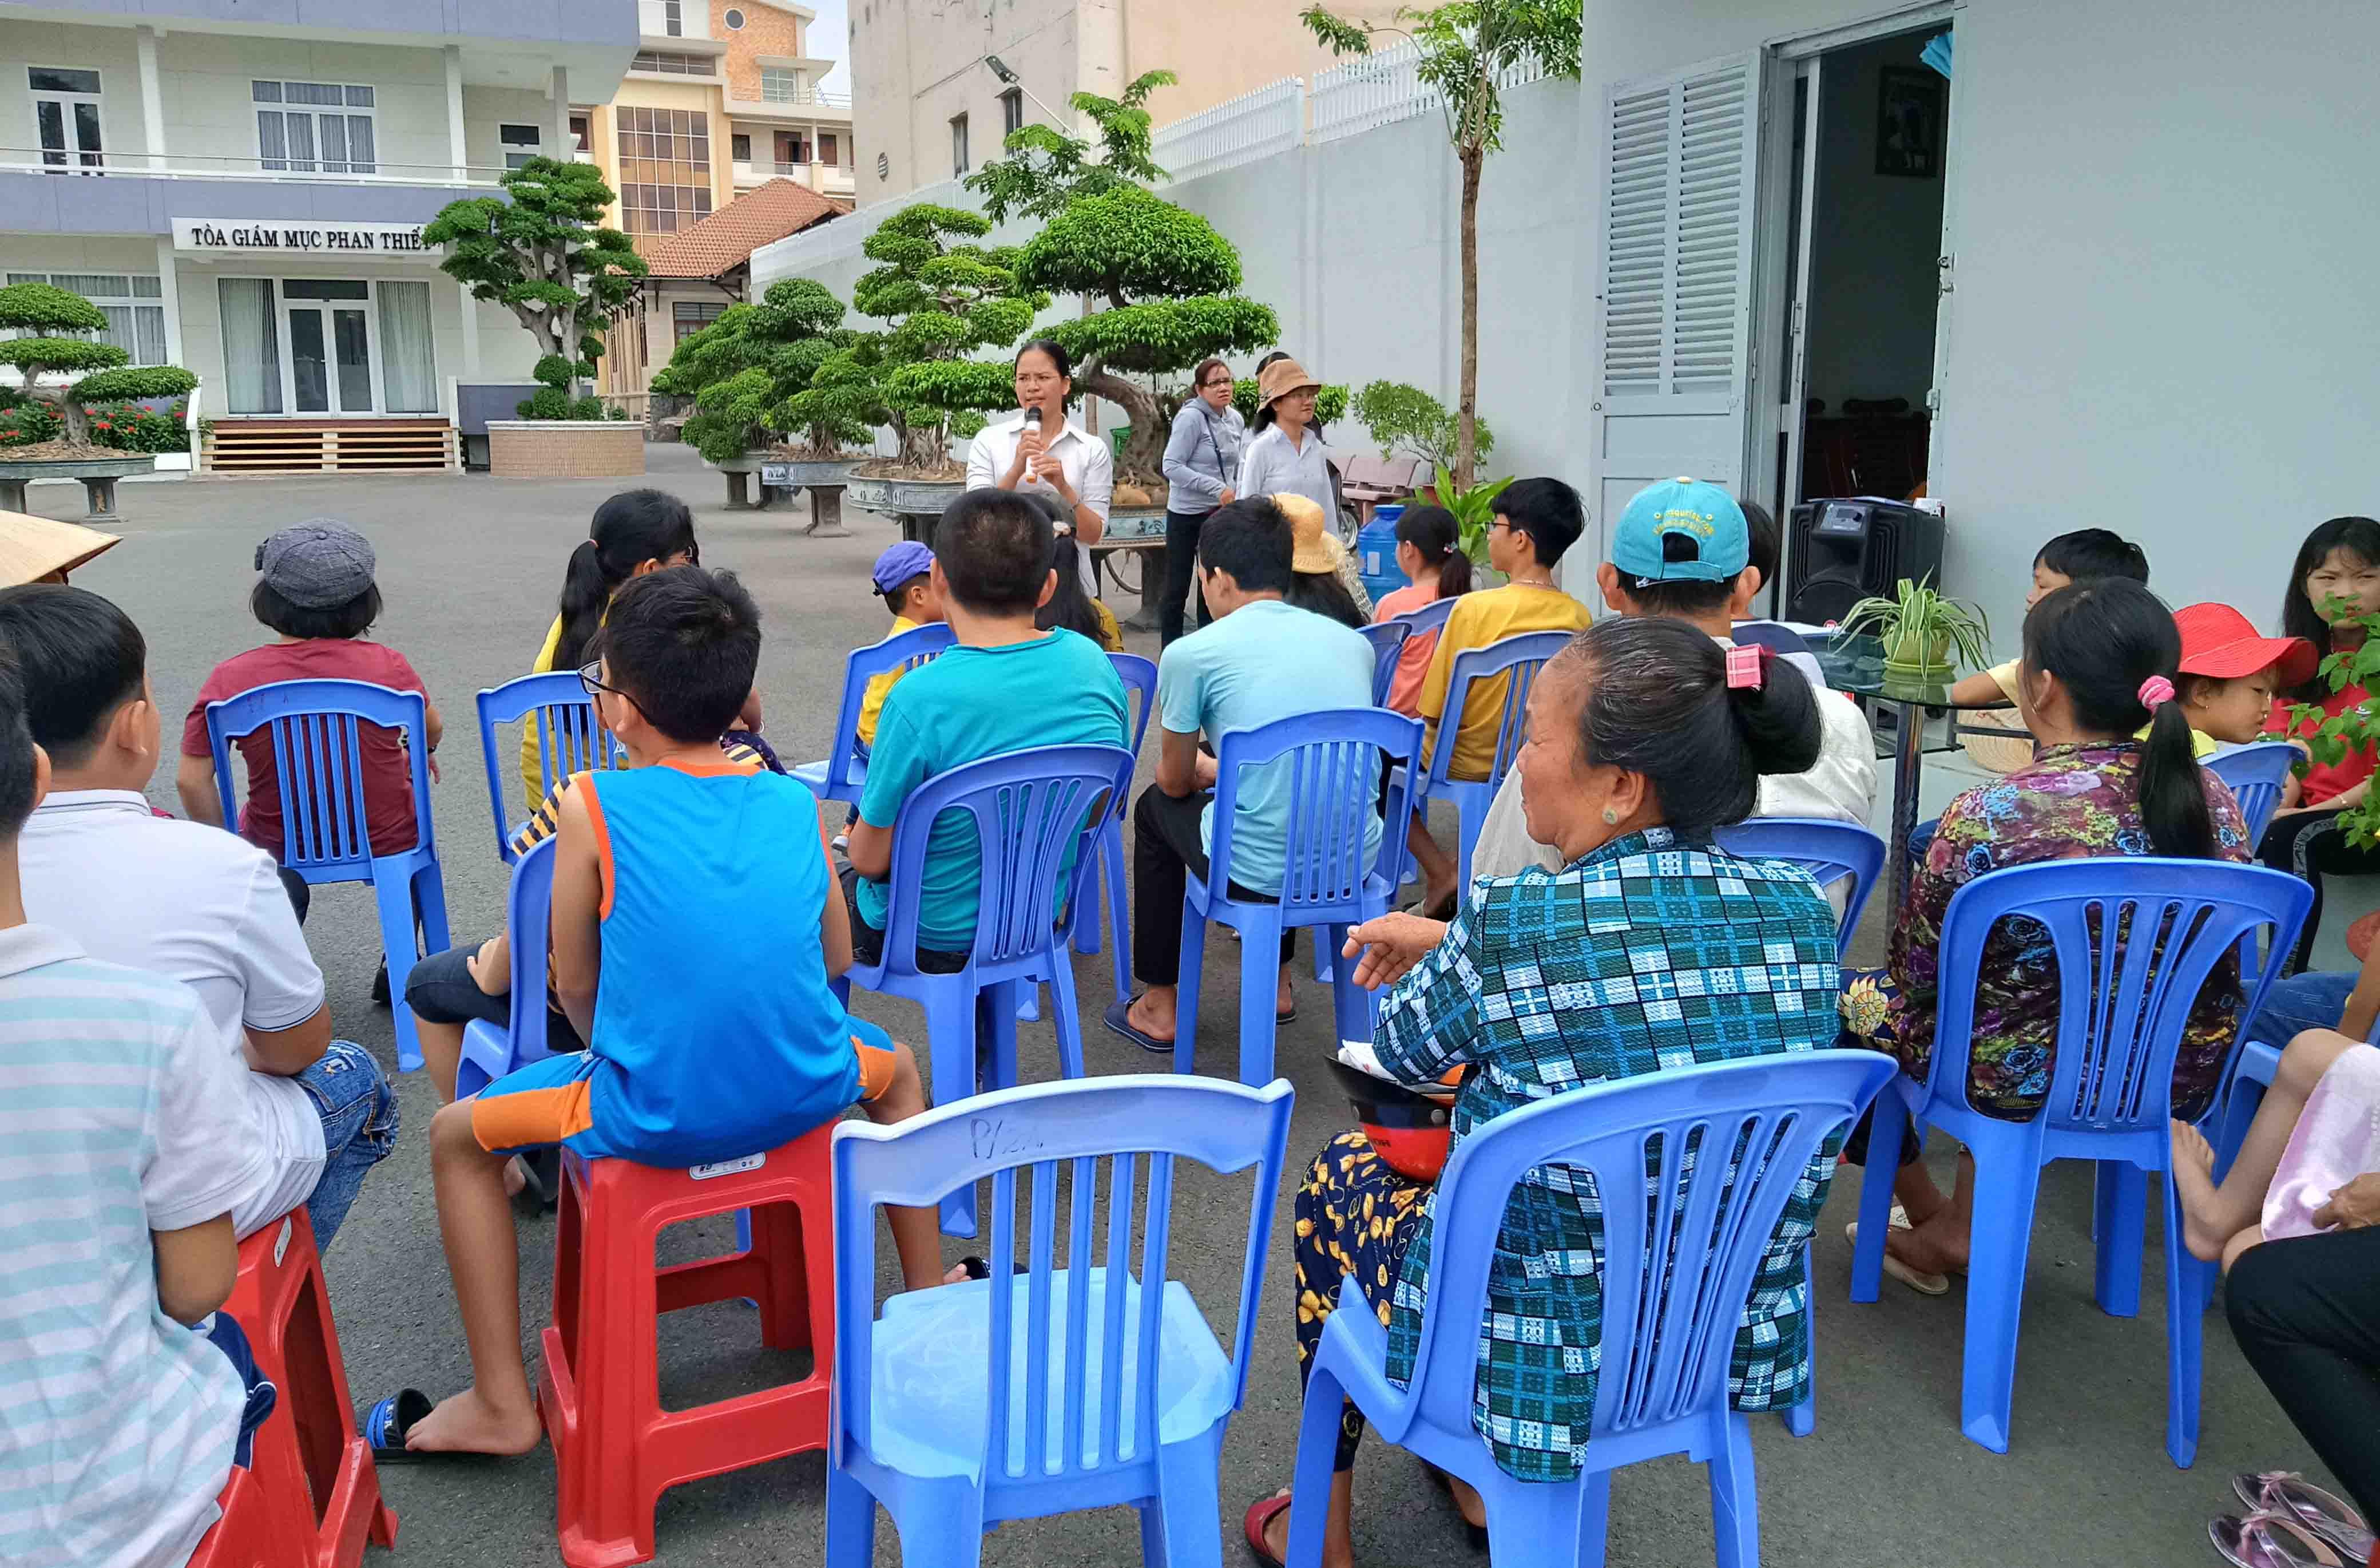 Caritas Phan Thiết: Tổ chức vui Trung Thu cho trẻ OVC - Trẻ khiếm thị